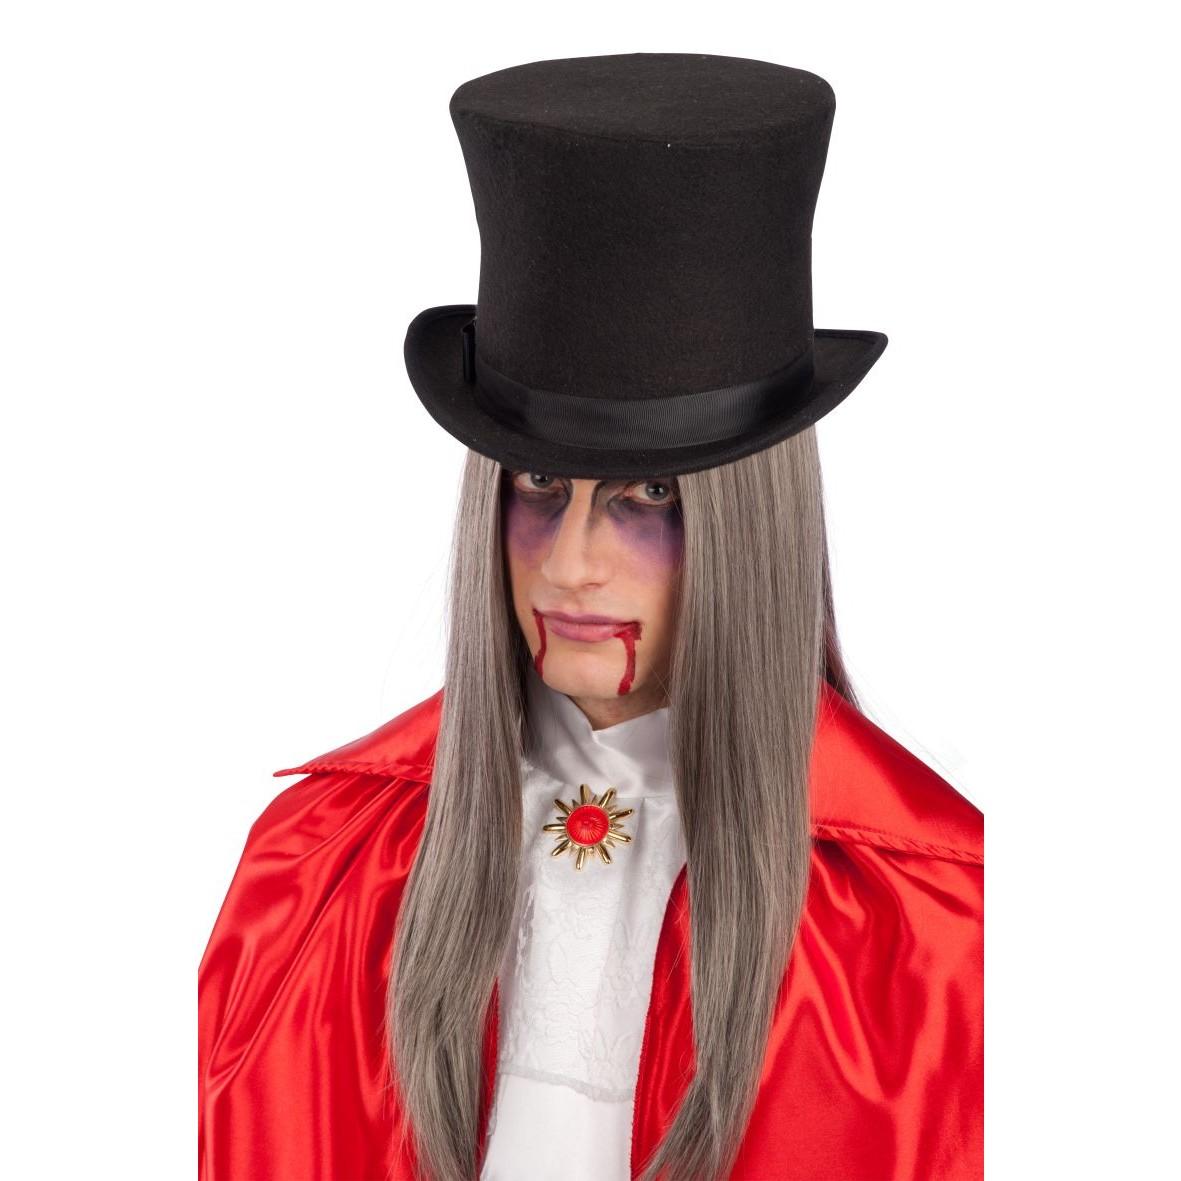 Crudelia DEVILE regina malvagia Nero e Bianco Halloween Costume 8-10